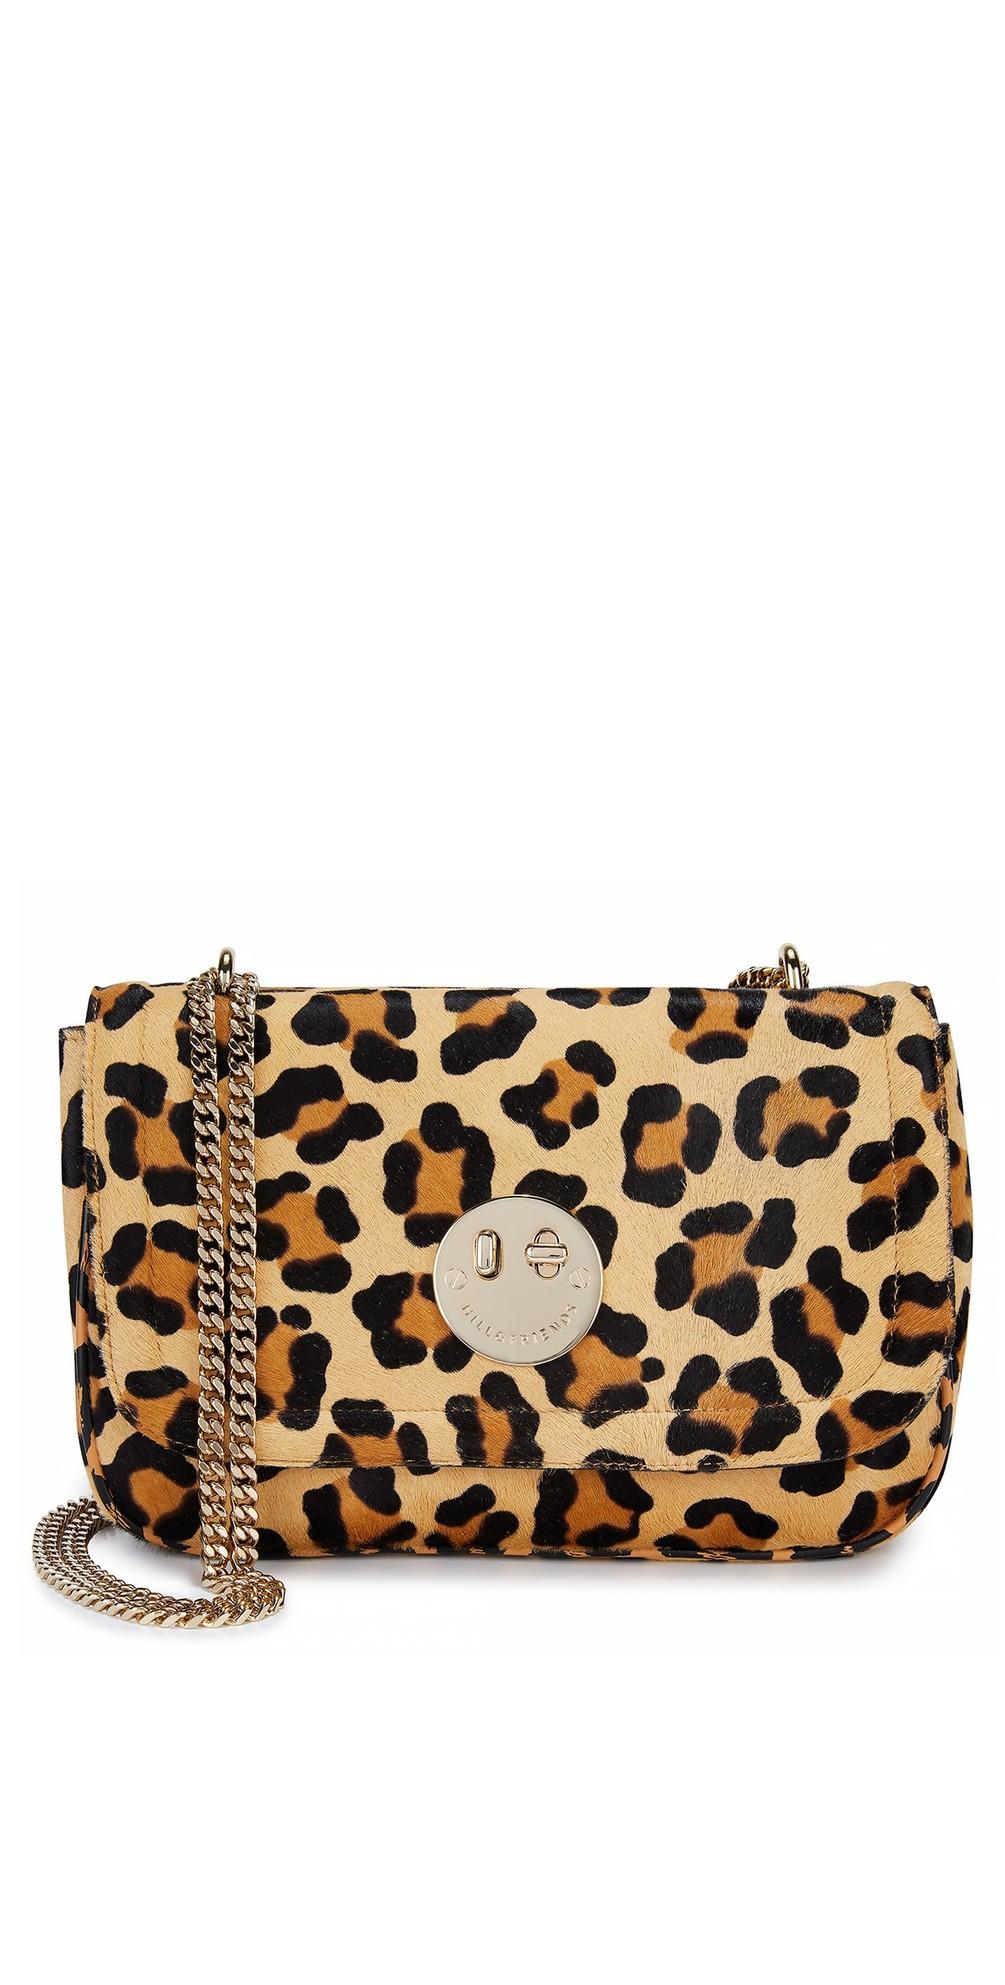 c6e94d806 Hill & Friends Happy Cross Body Chain Bag in Natural Leopard